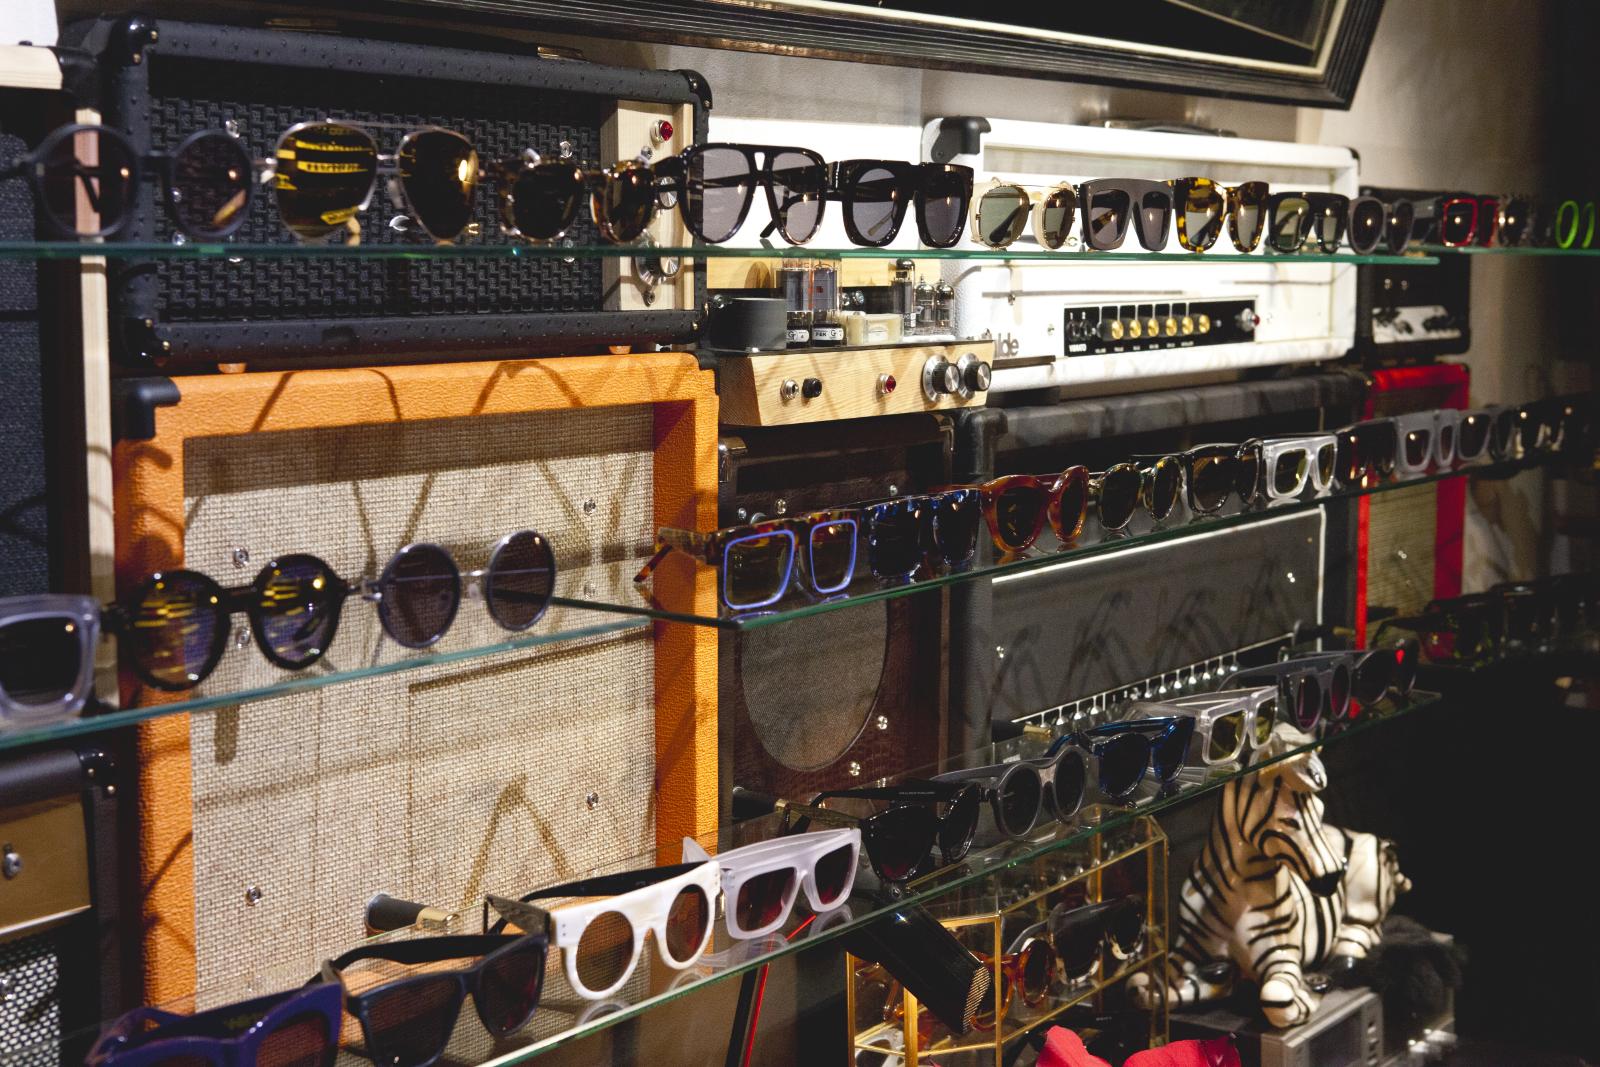 Robert_Adalierd_Rob_Design_Furniture_Wilde_sunglasses11.jpg